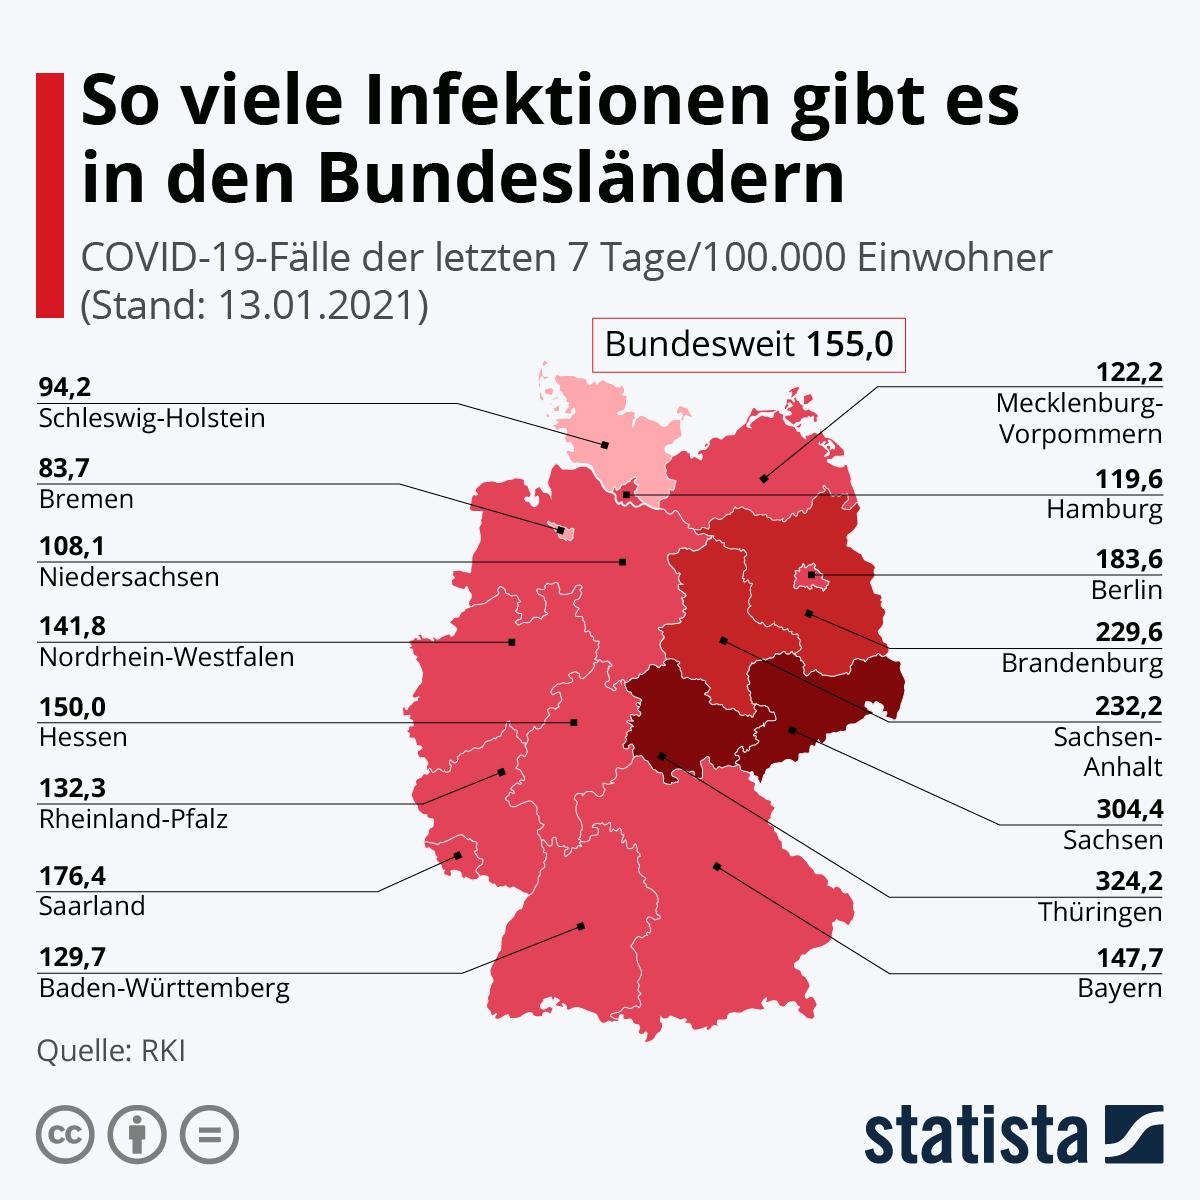 Coronavirus: Die Infektionsrate in den Bundesländern | Statista